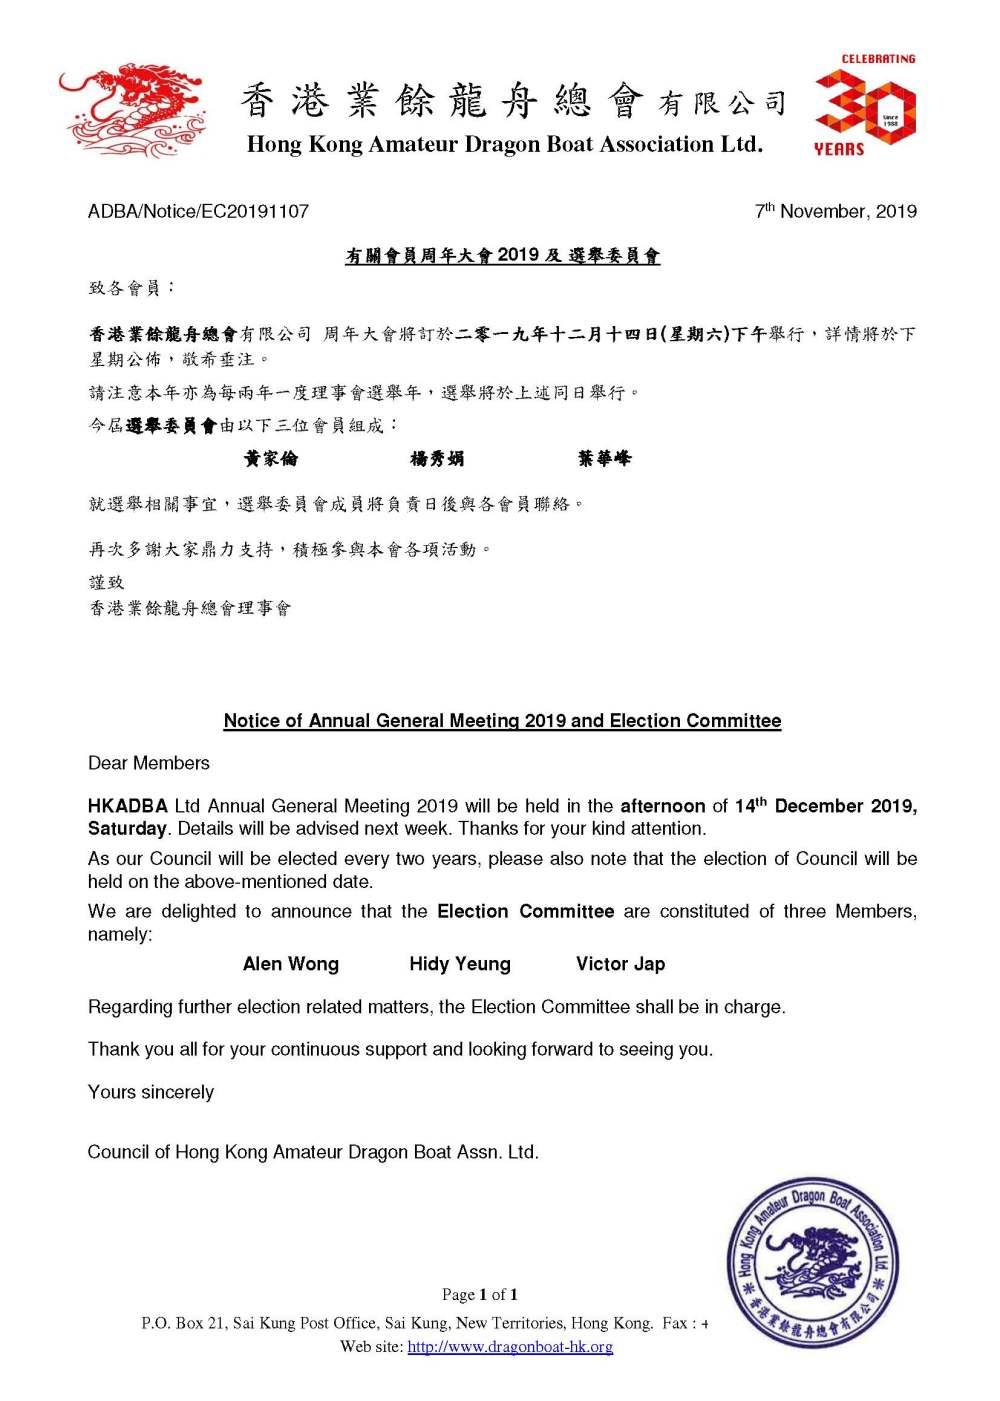 HKADBA - Notice - AGM - EC201911077(2)